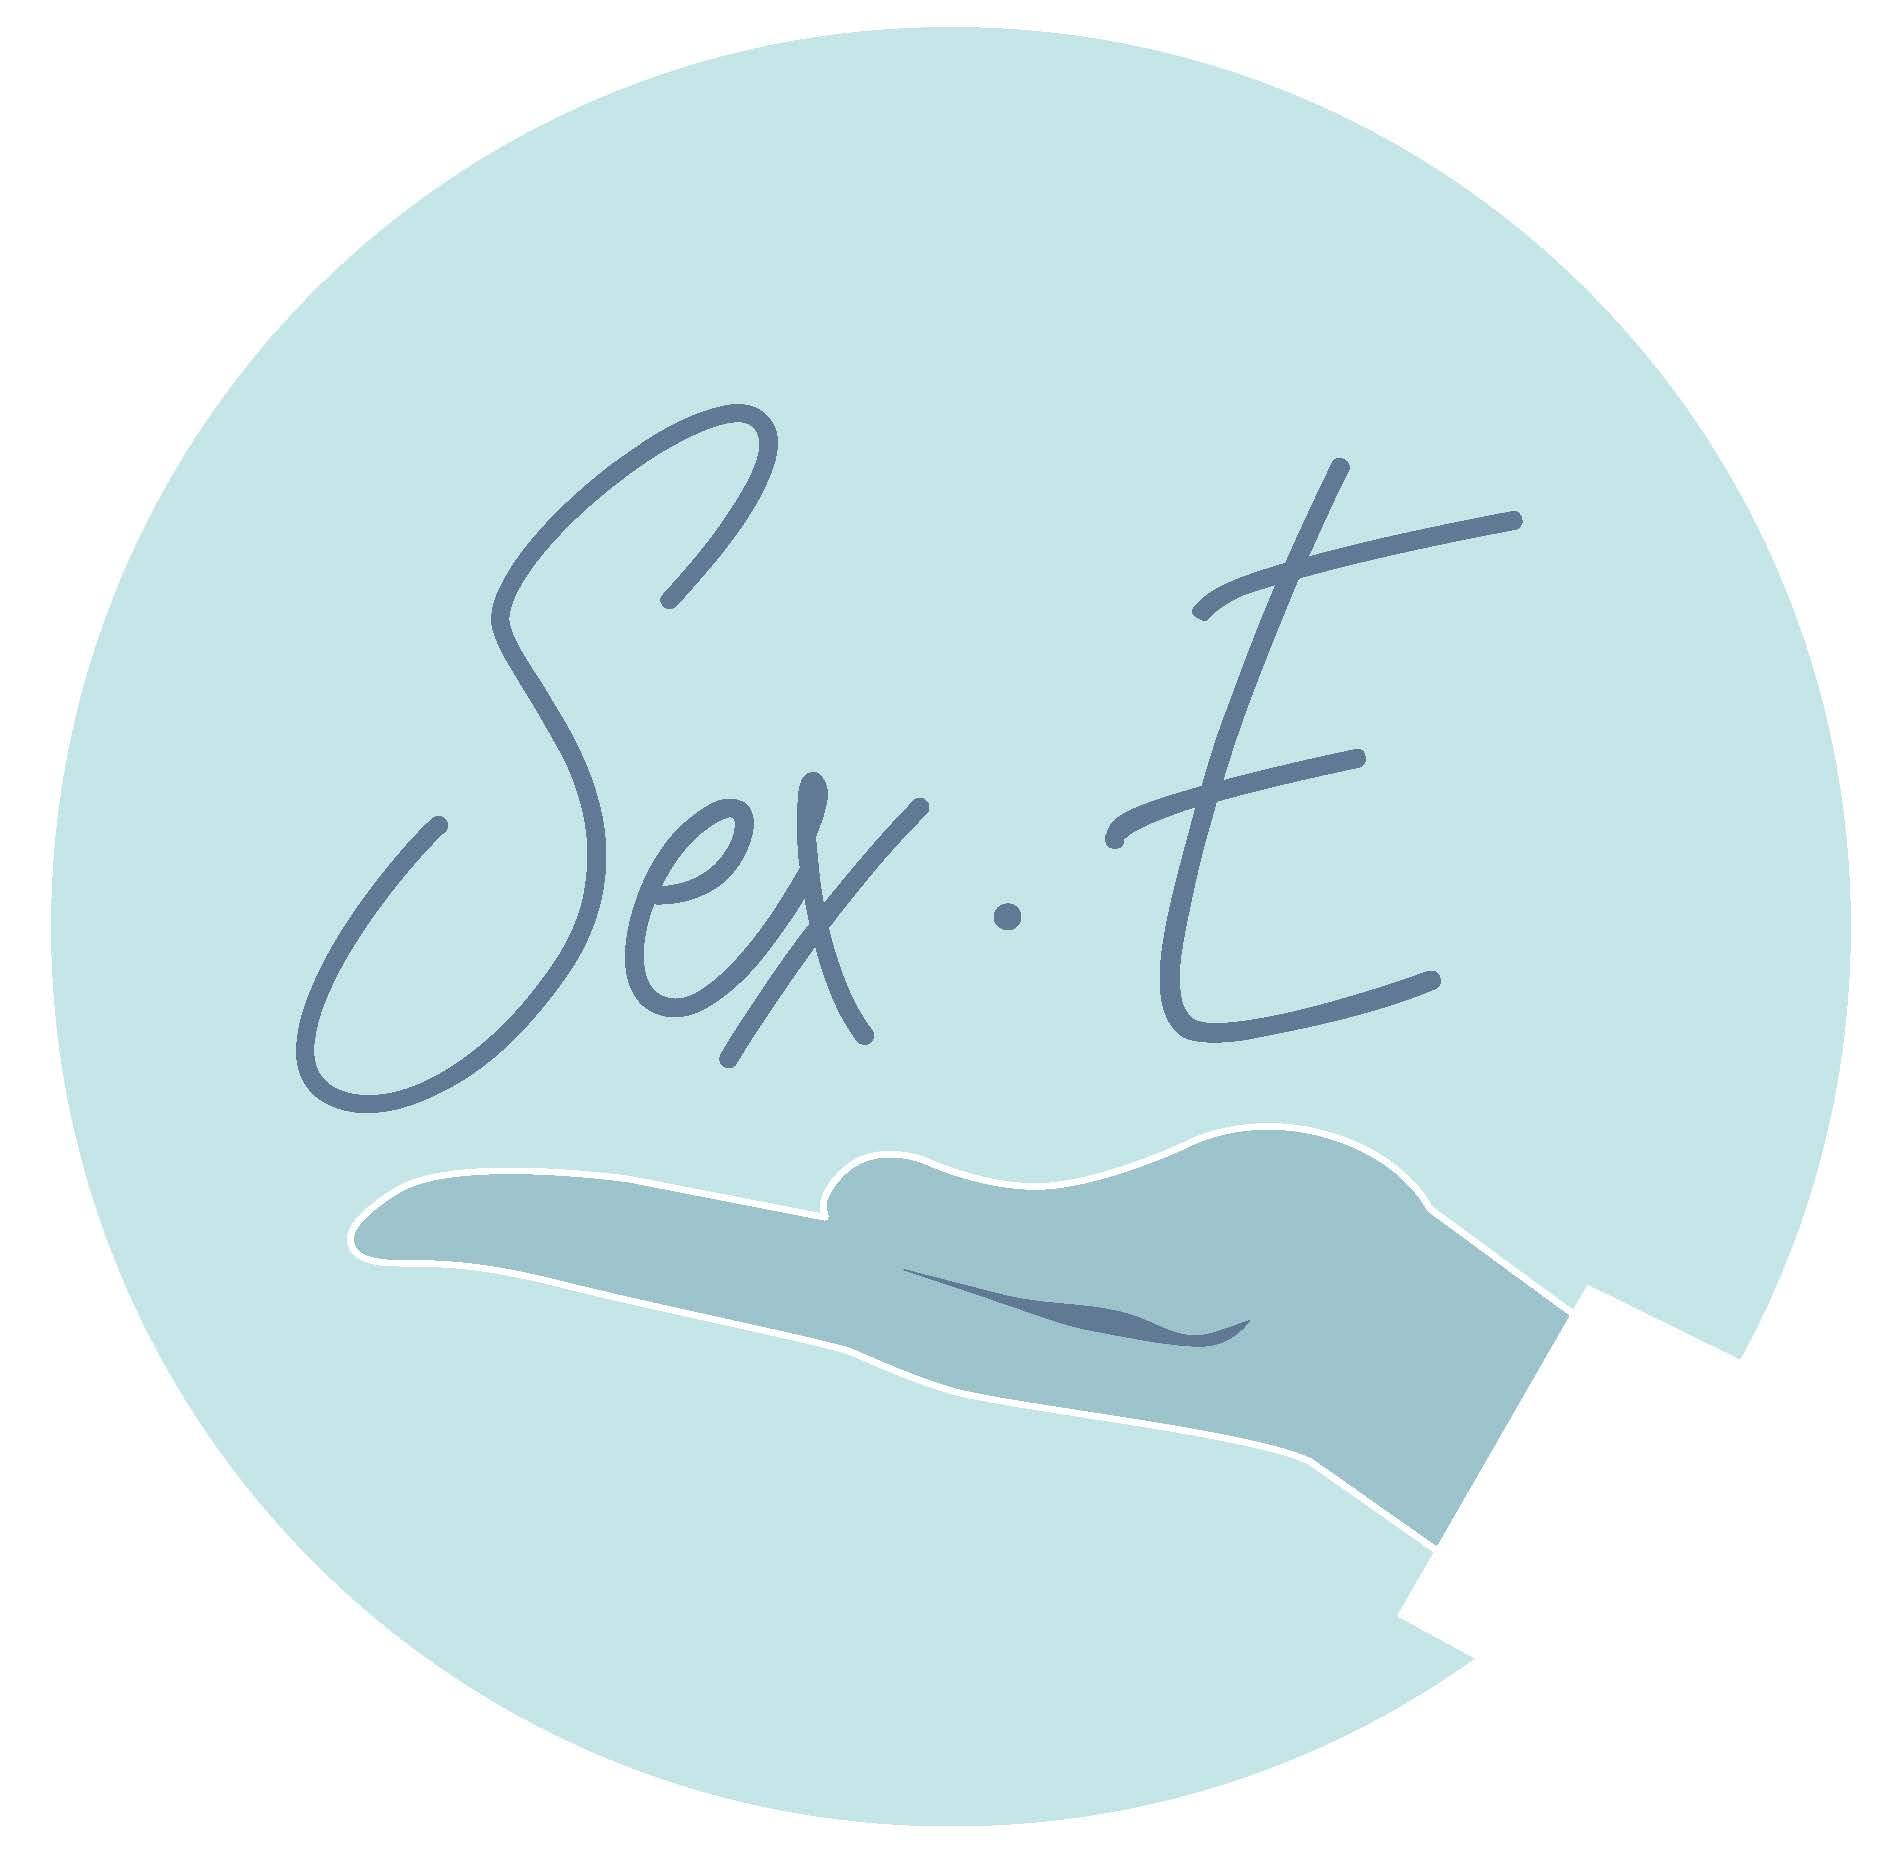 SexELogo.jpg